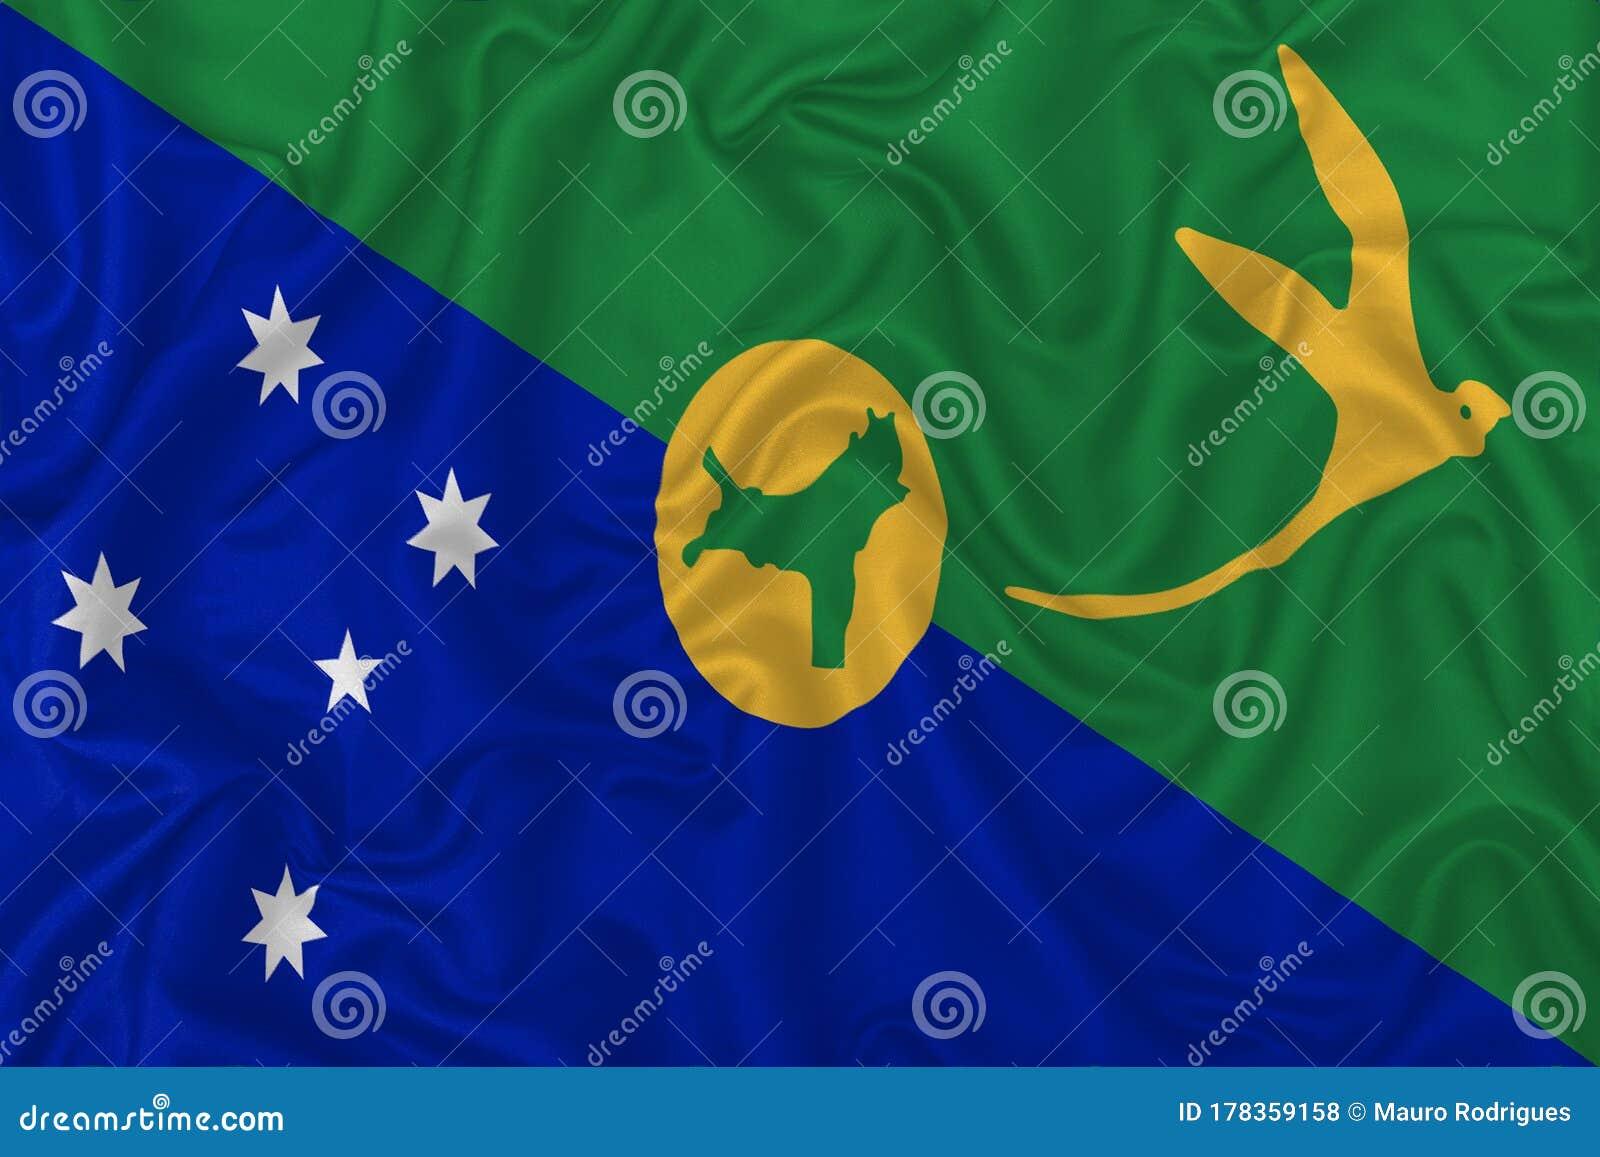 Christmas Island flag stock illustration. Illustration of style - 178359158